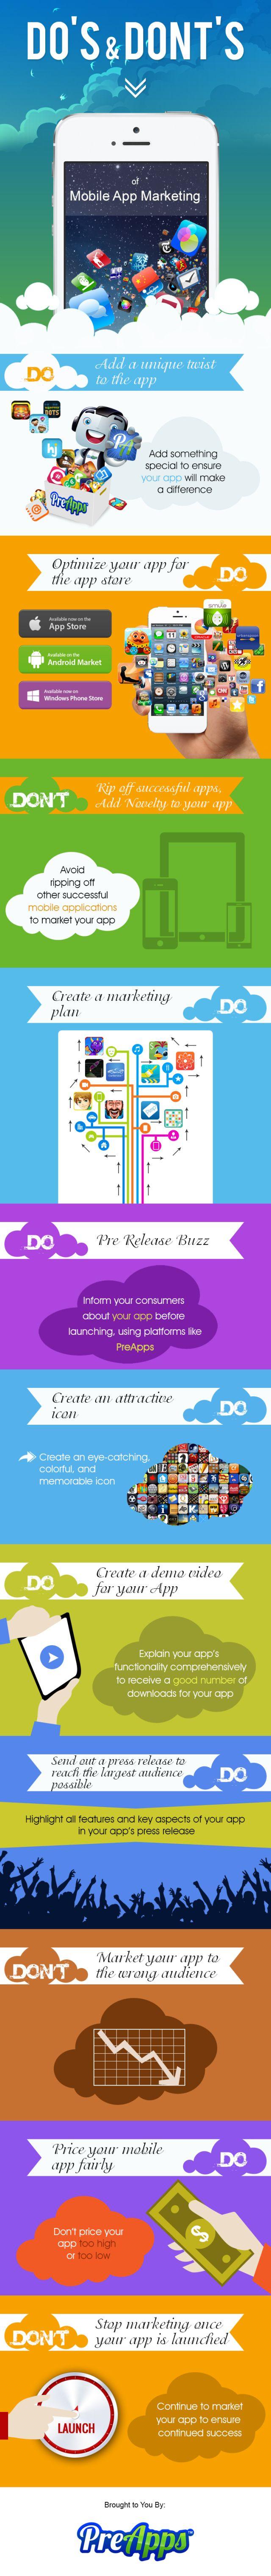 Do's & Dont's of mobile APP marketing #infografia #infographic #marketing